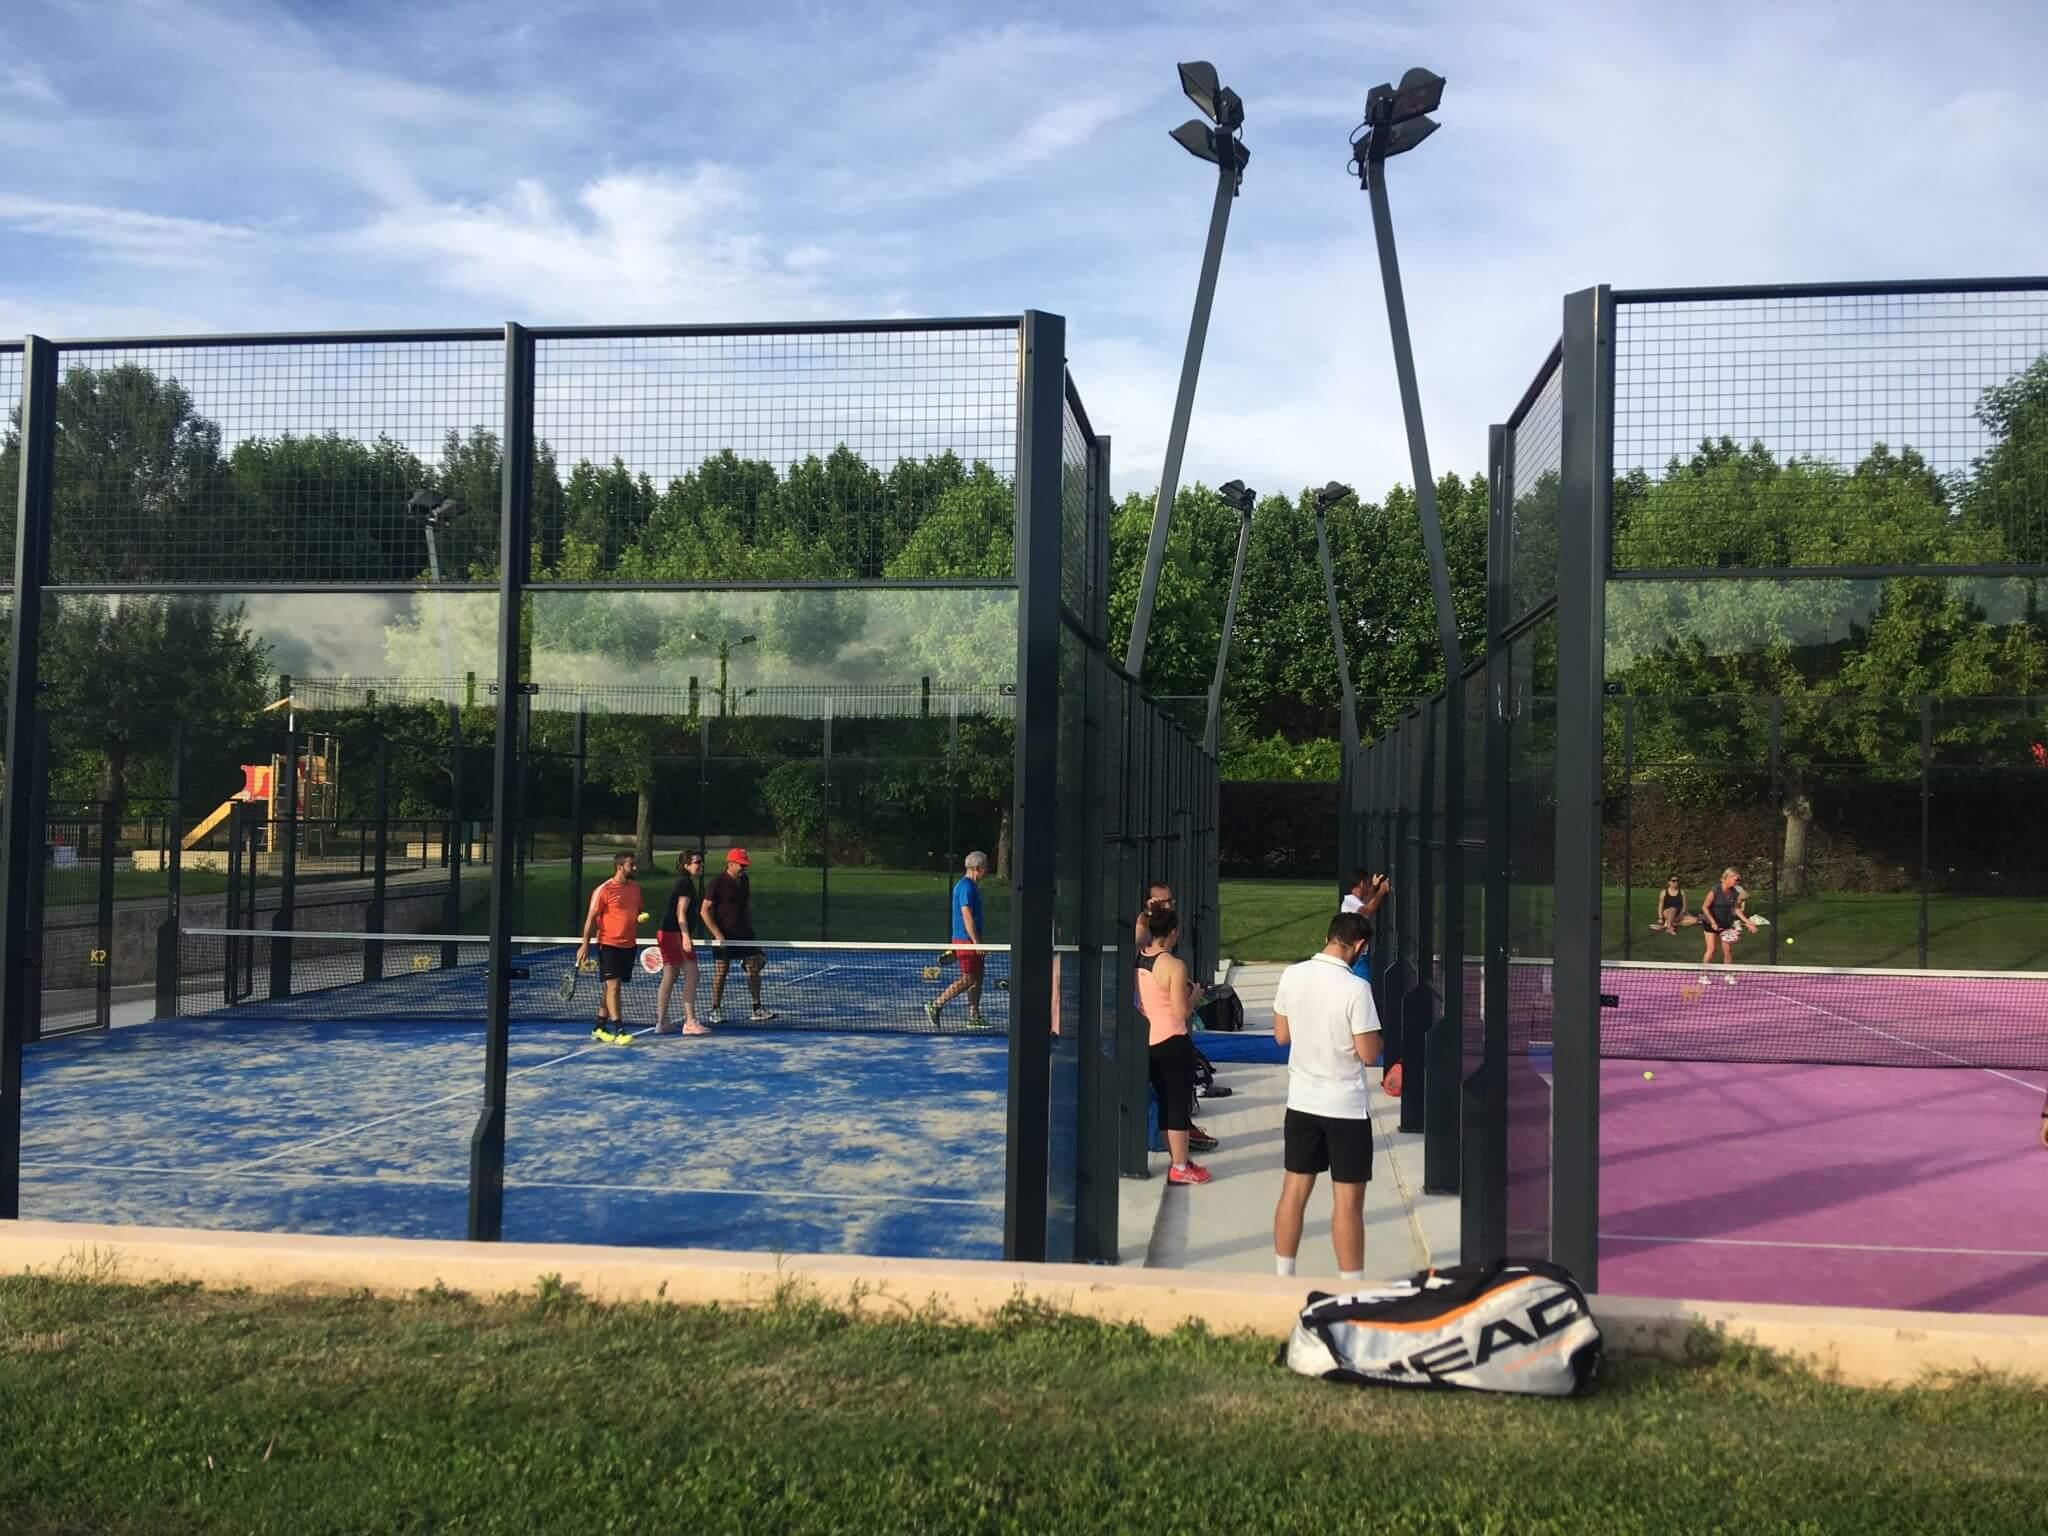 tournoi AUC PADEL tennis